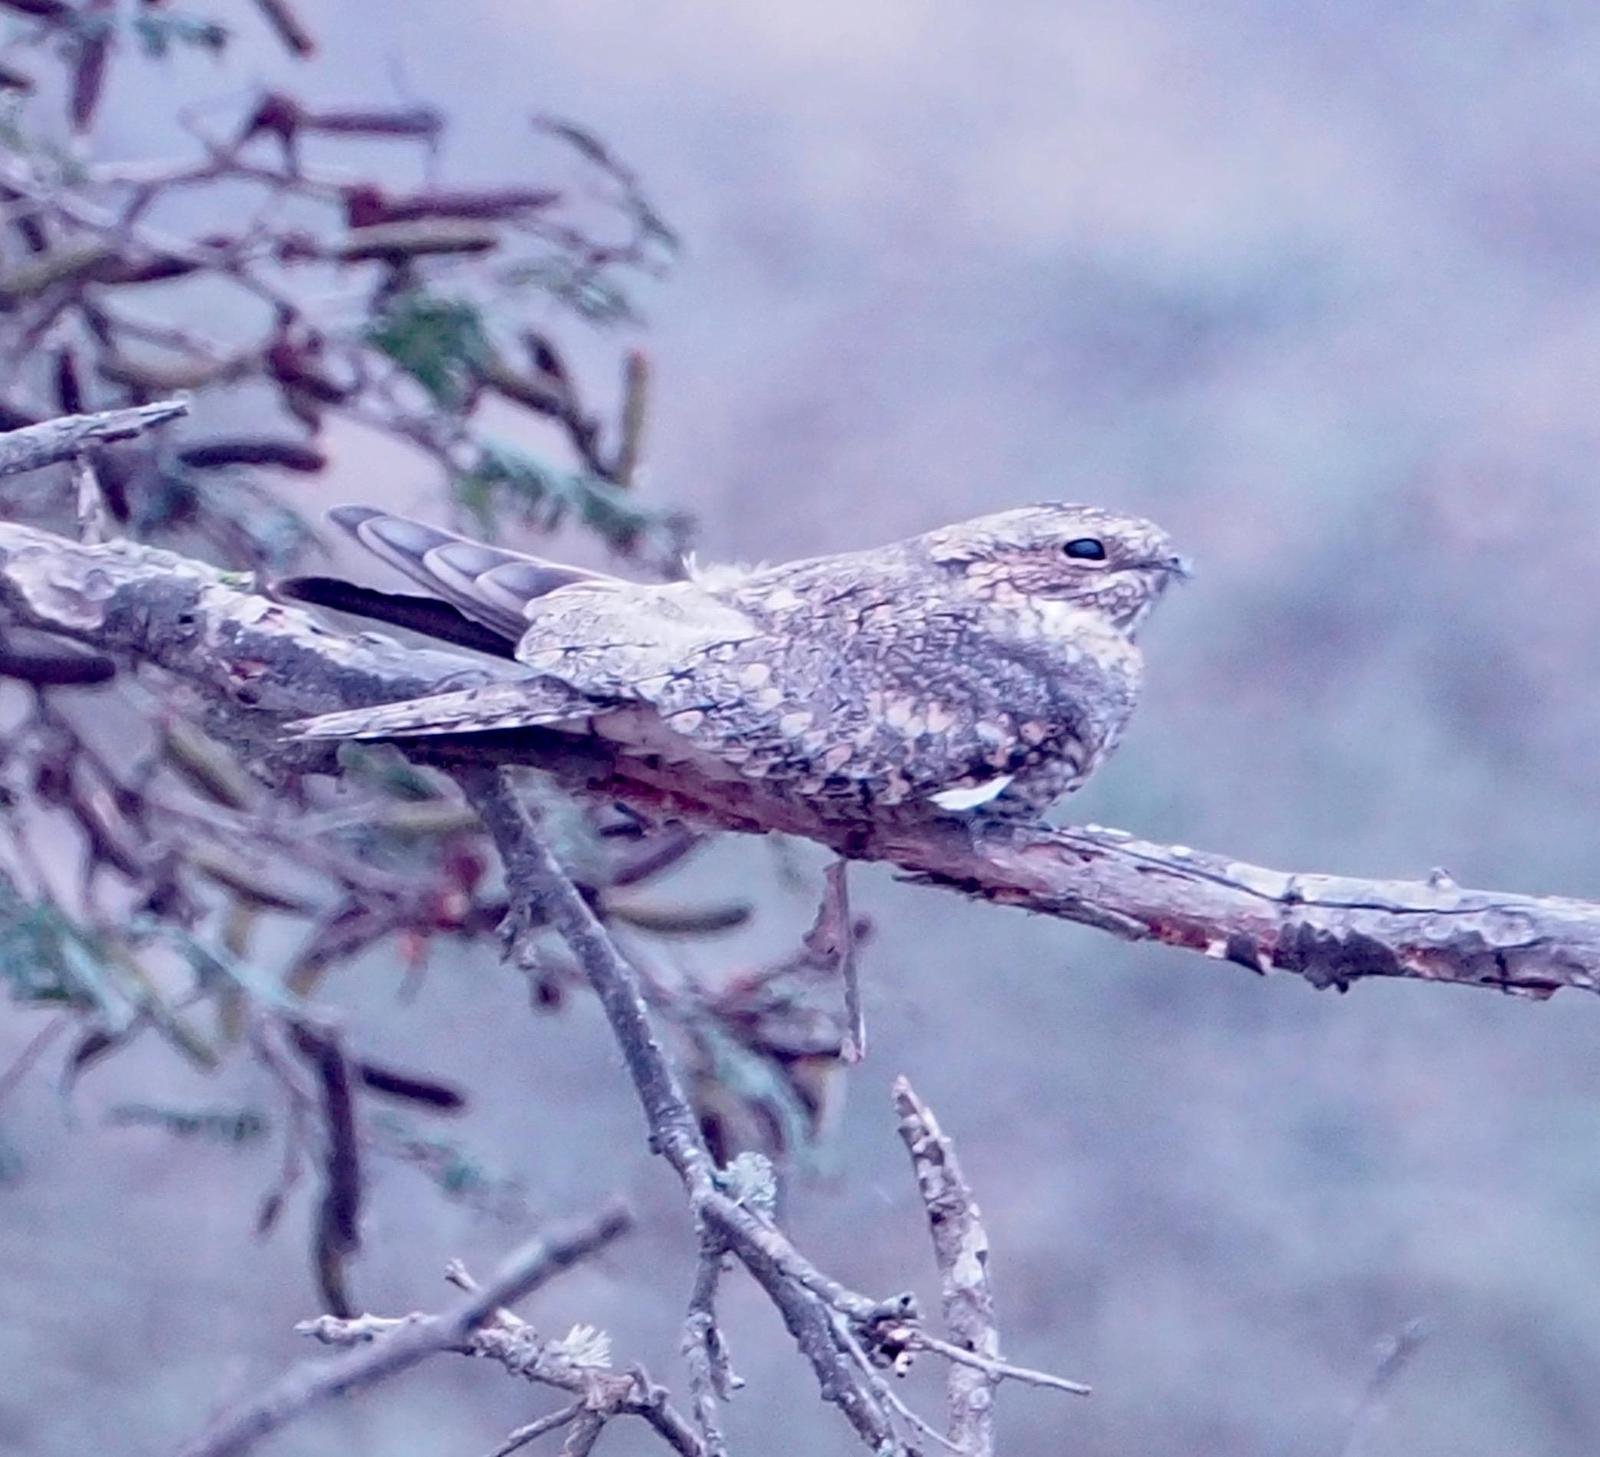 Lesser Nighthawk Photo by Geraint Langford